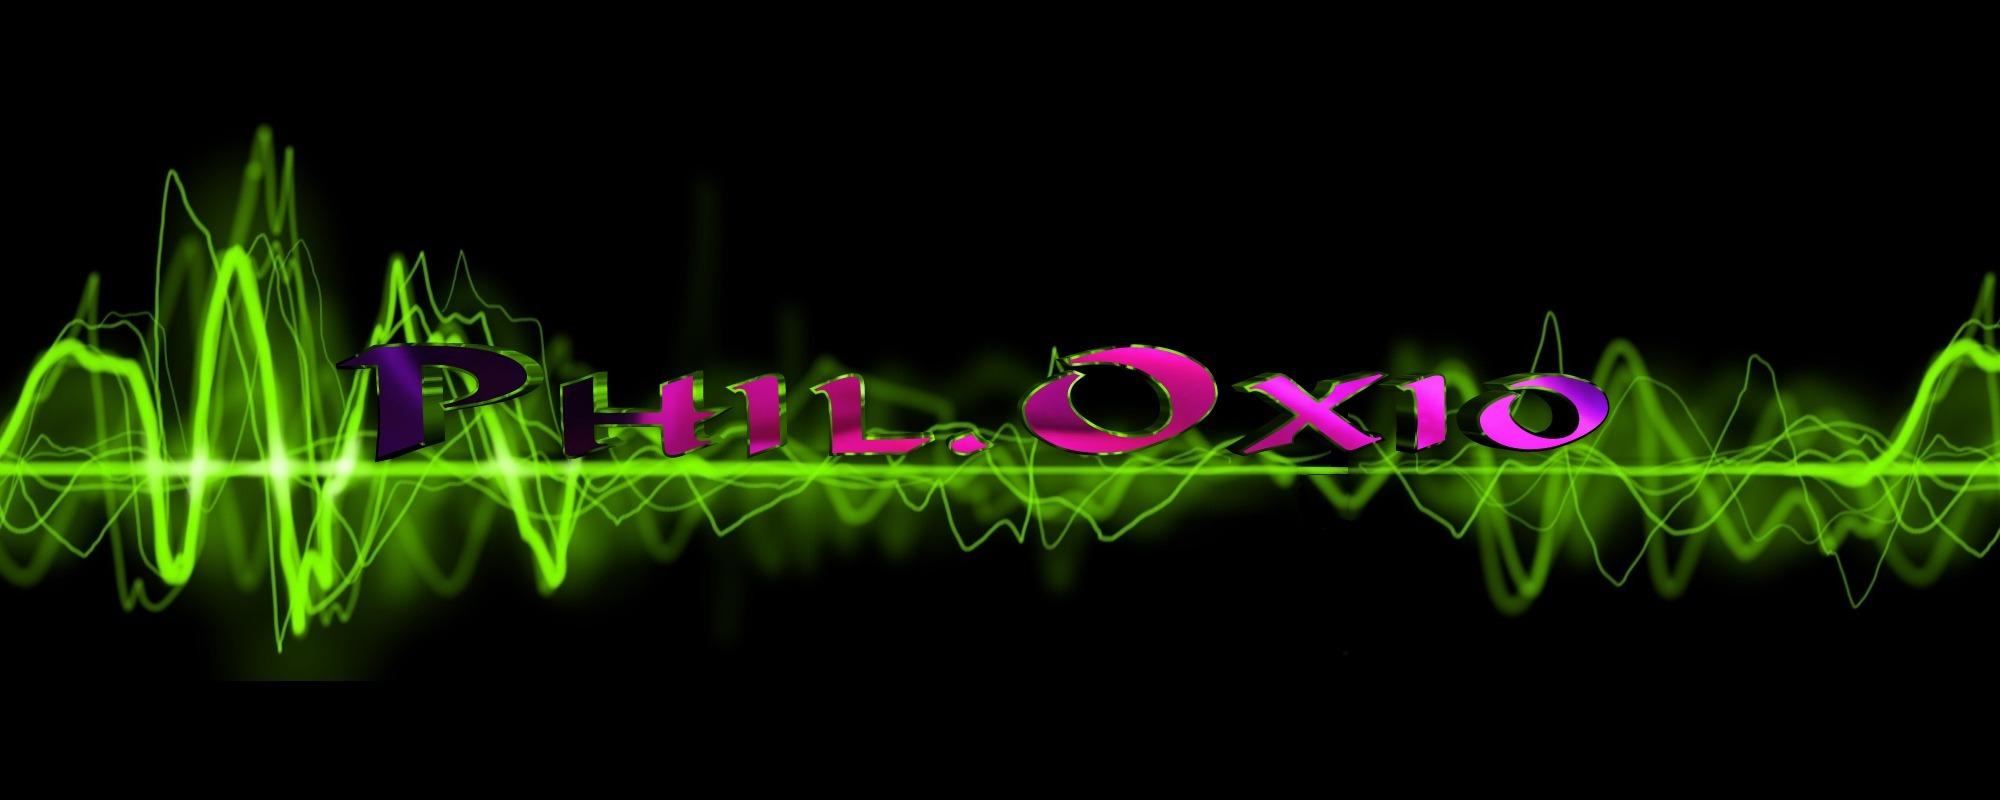 PHILOXIO (@philoxio) Cover Image